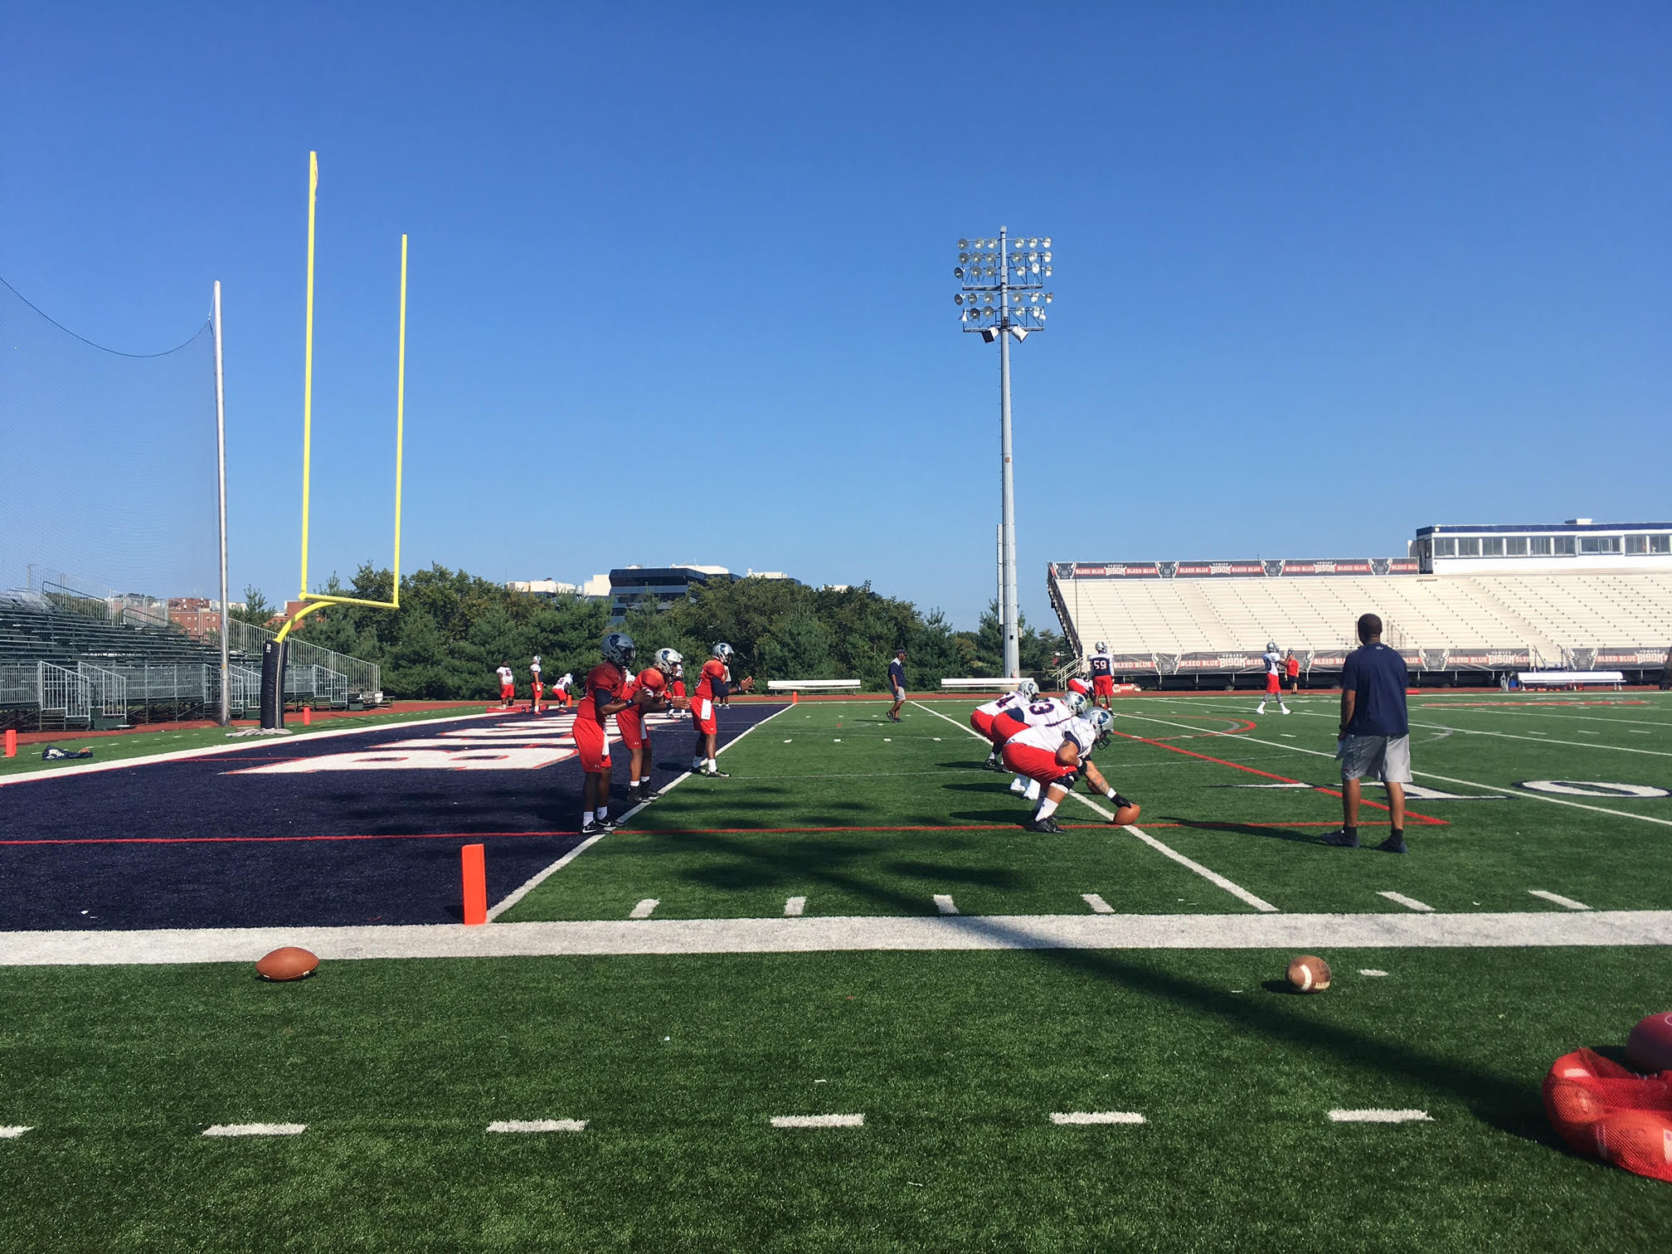 Quarterback Caylin Newton (#3, middle, in red) won the starting quarterback job as a true freshman. (WTOP/Noah Frank)